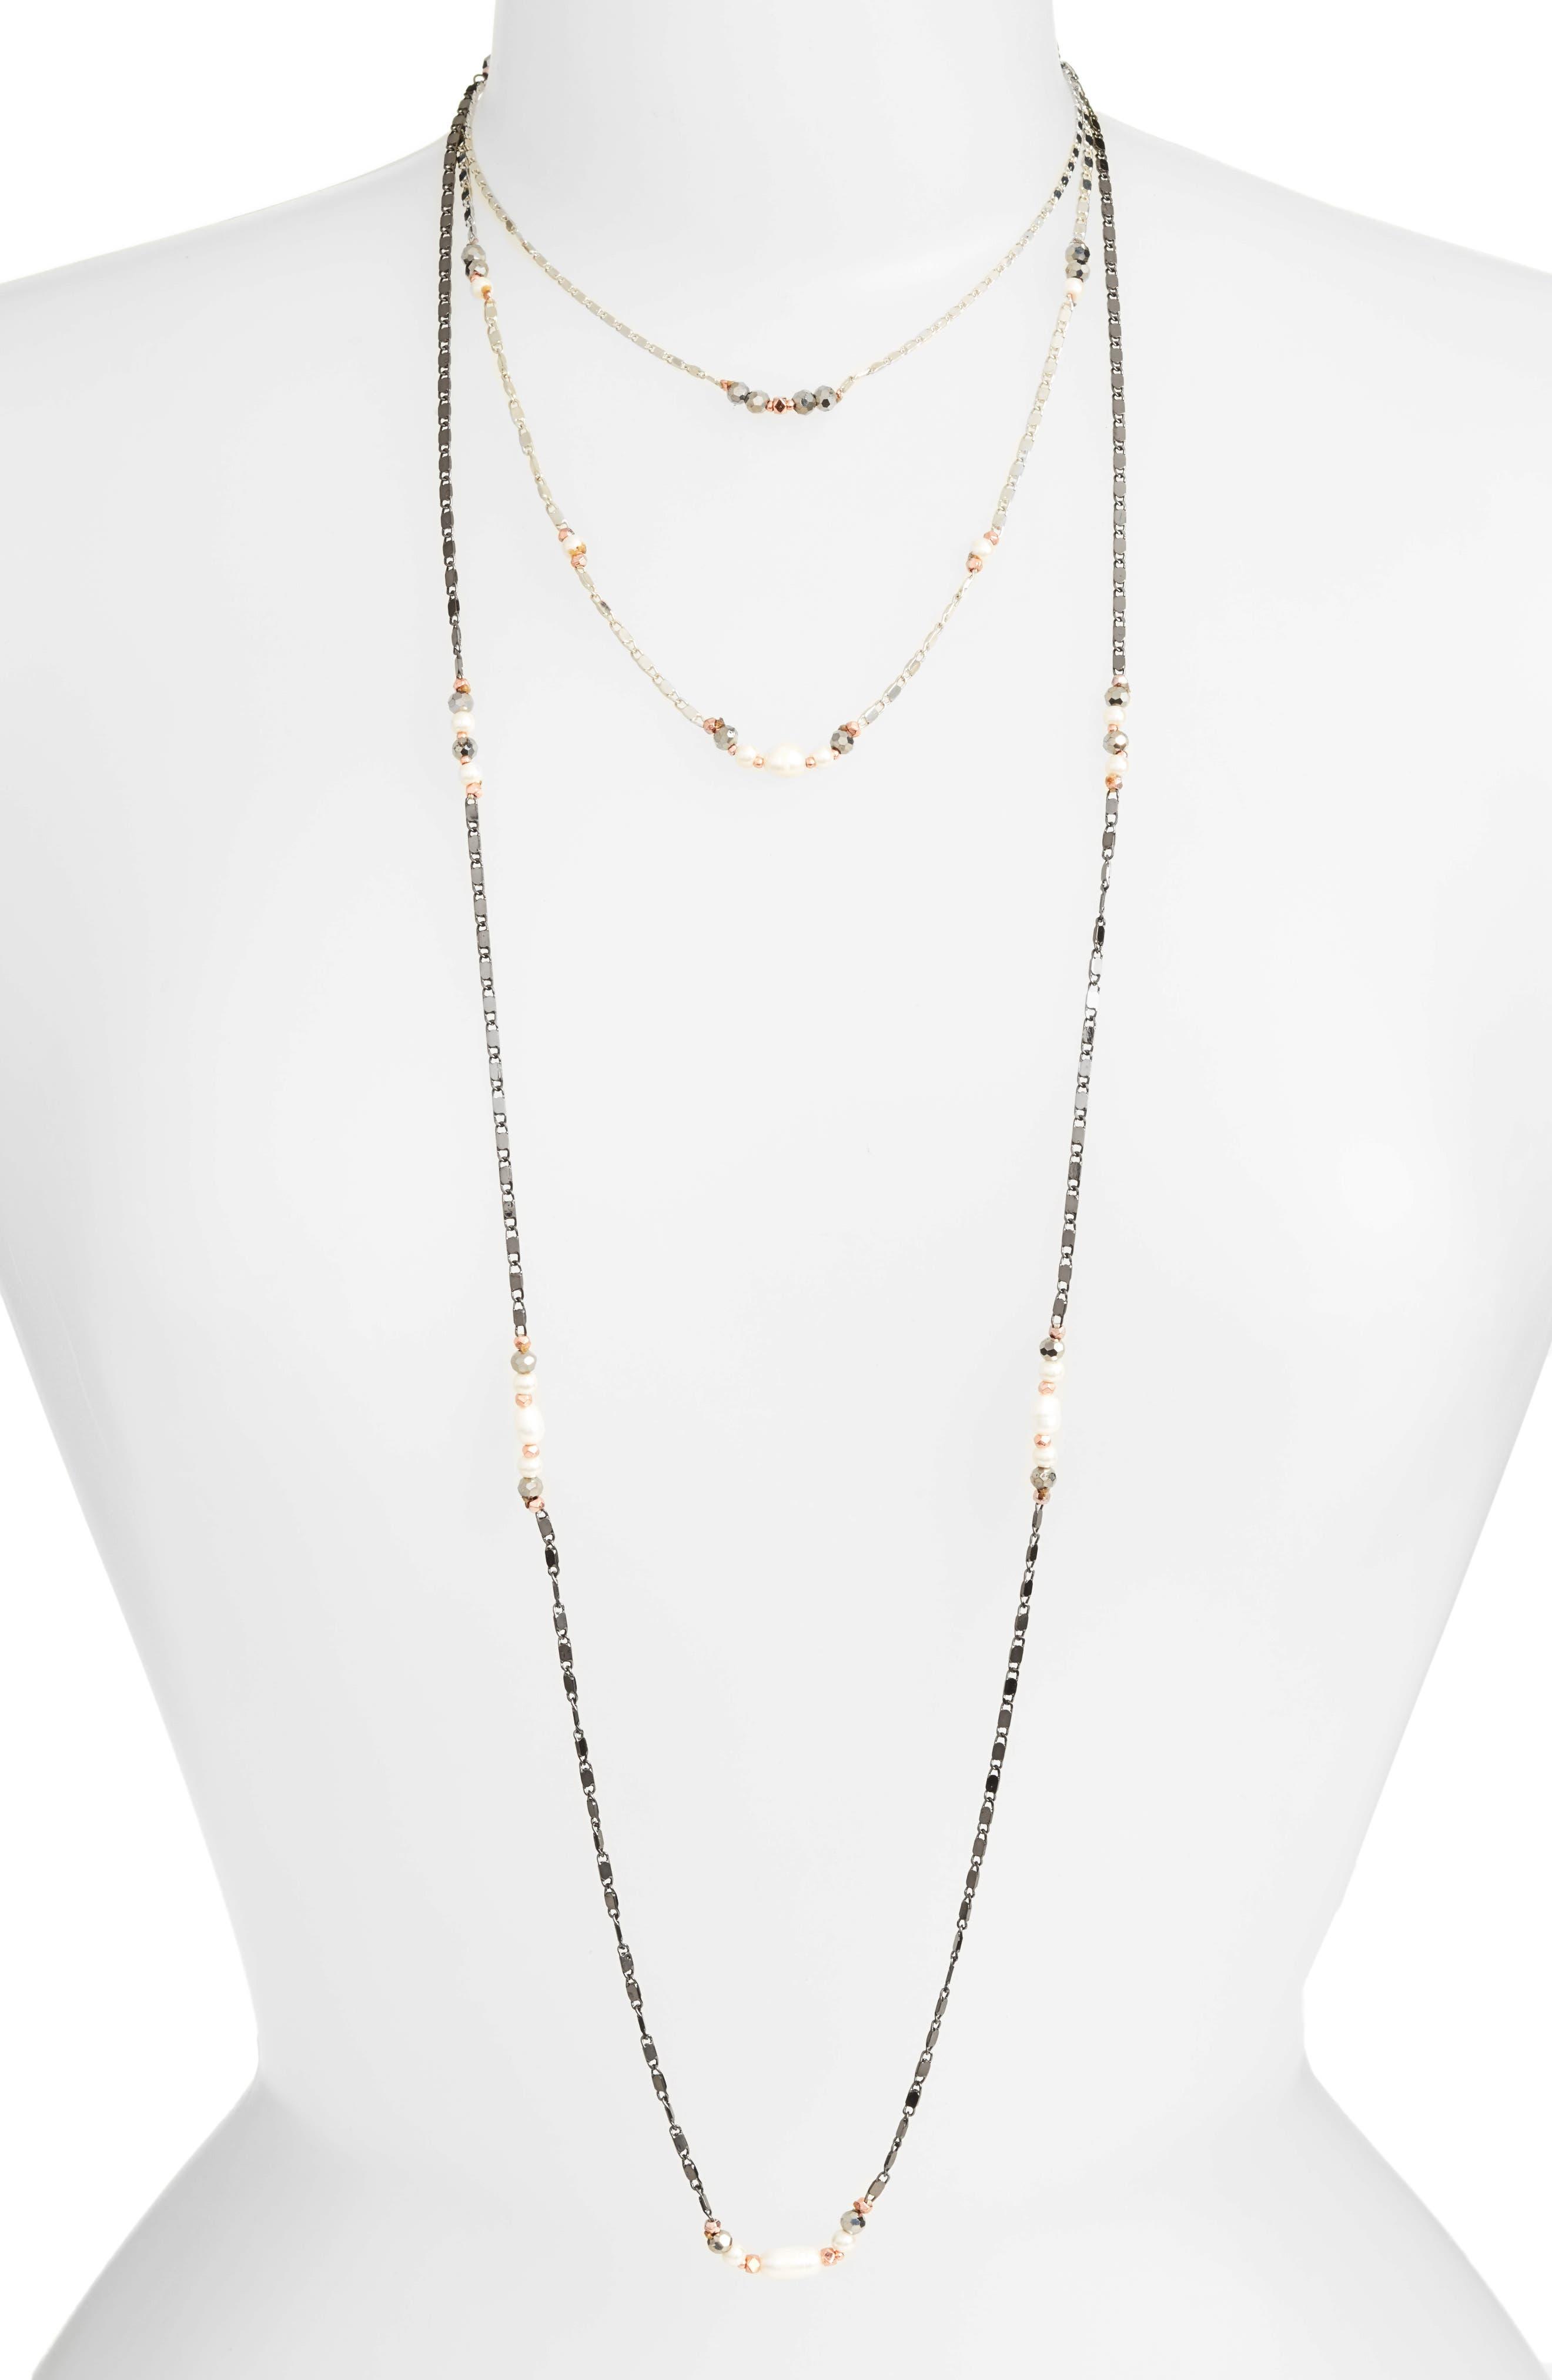 Main Image - Nakamol Design Layered Chain Necklace